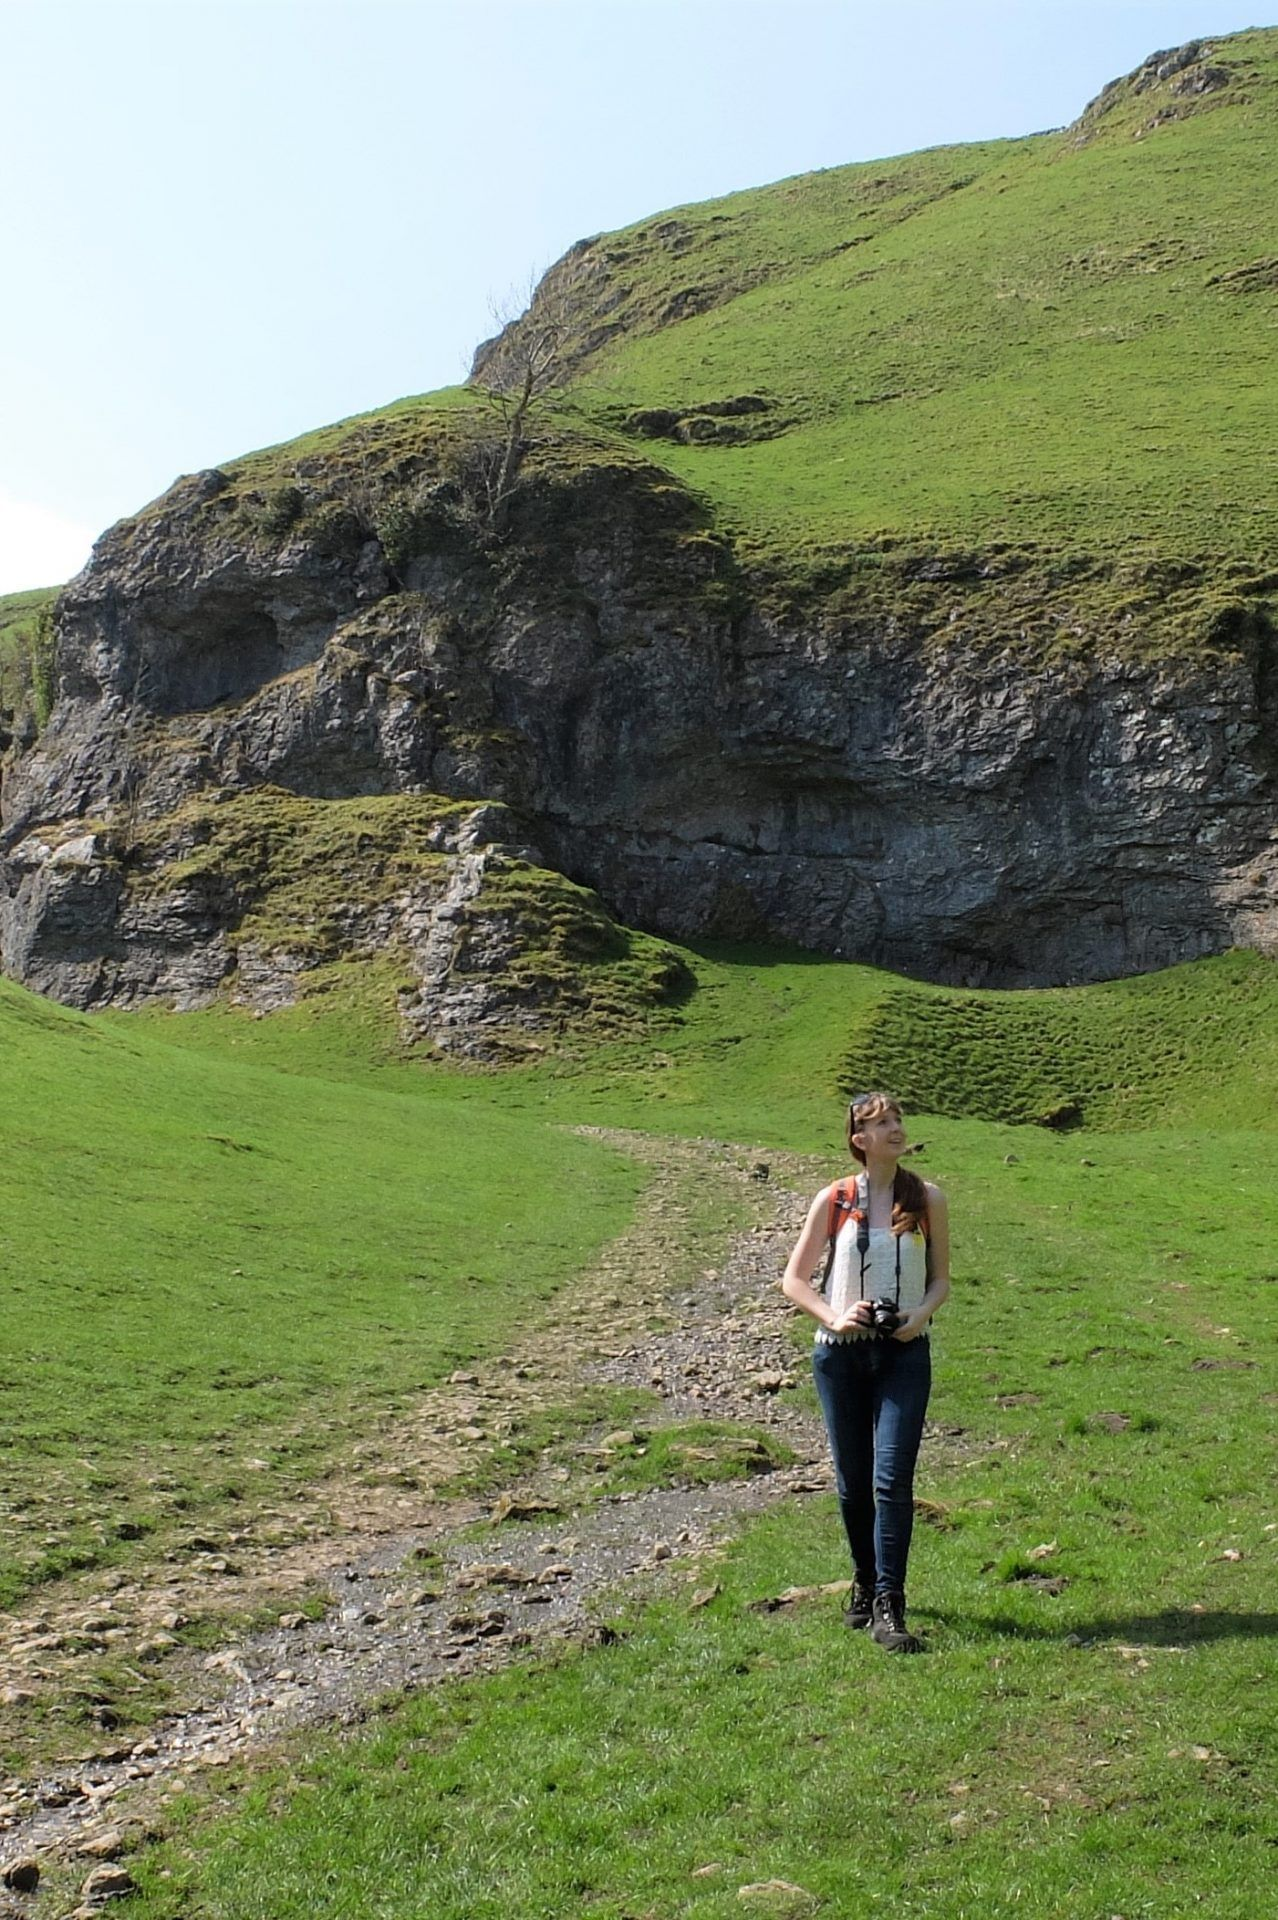 Castleton, Cavedale and the Peak District National Park